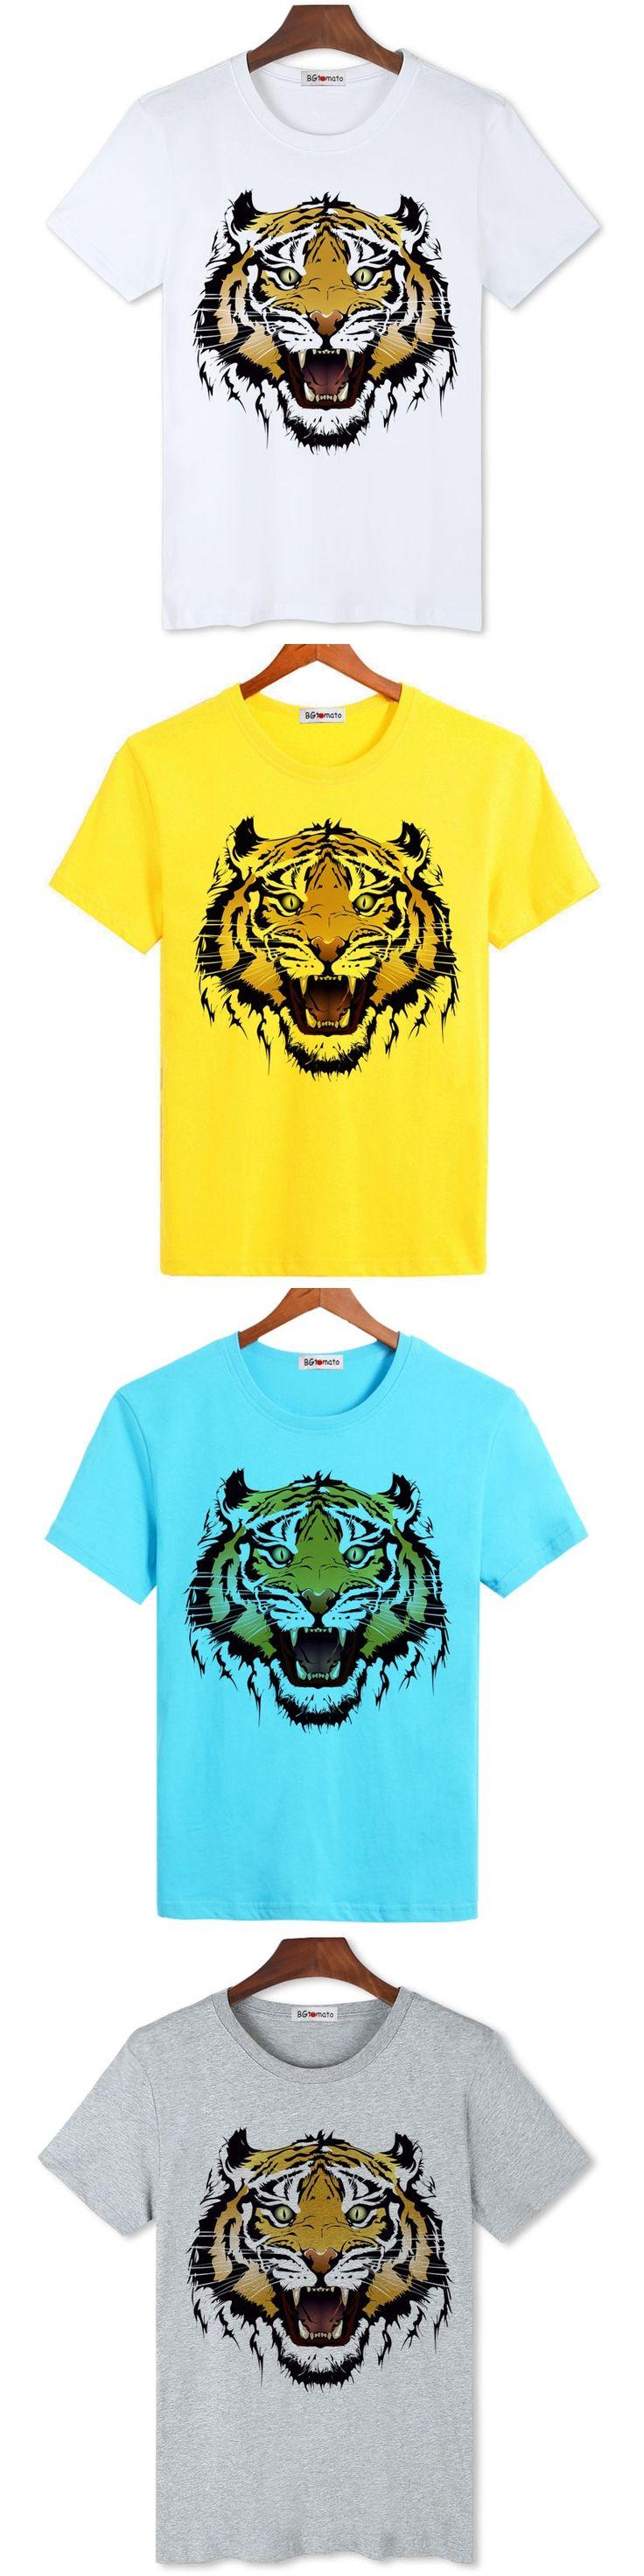 BGtomato New arrival popular Tiger print t shirt men hot sale active 3D shirt Brand good quality comfortable modal tops shirts